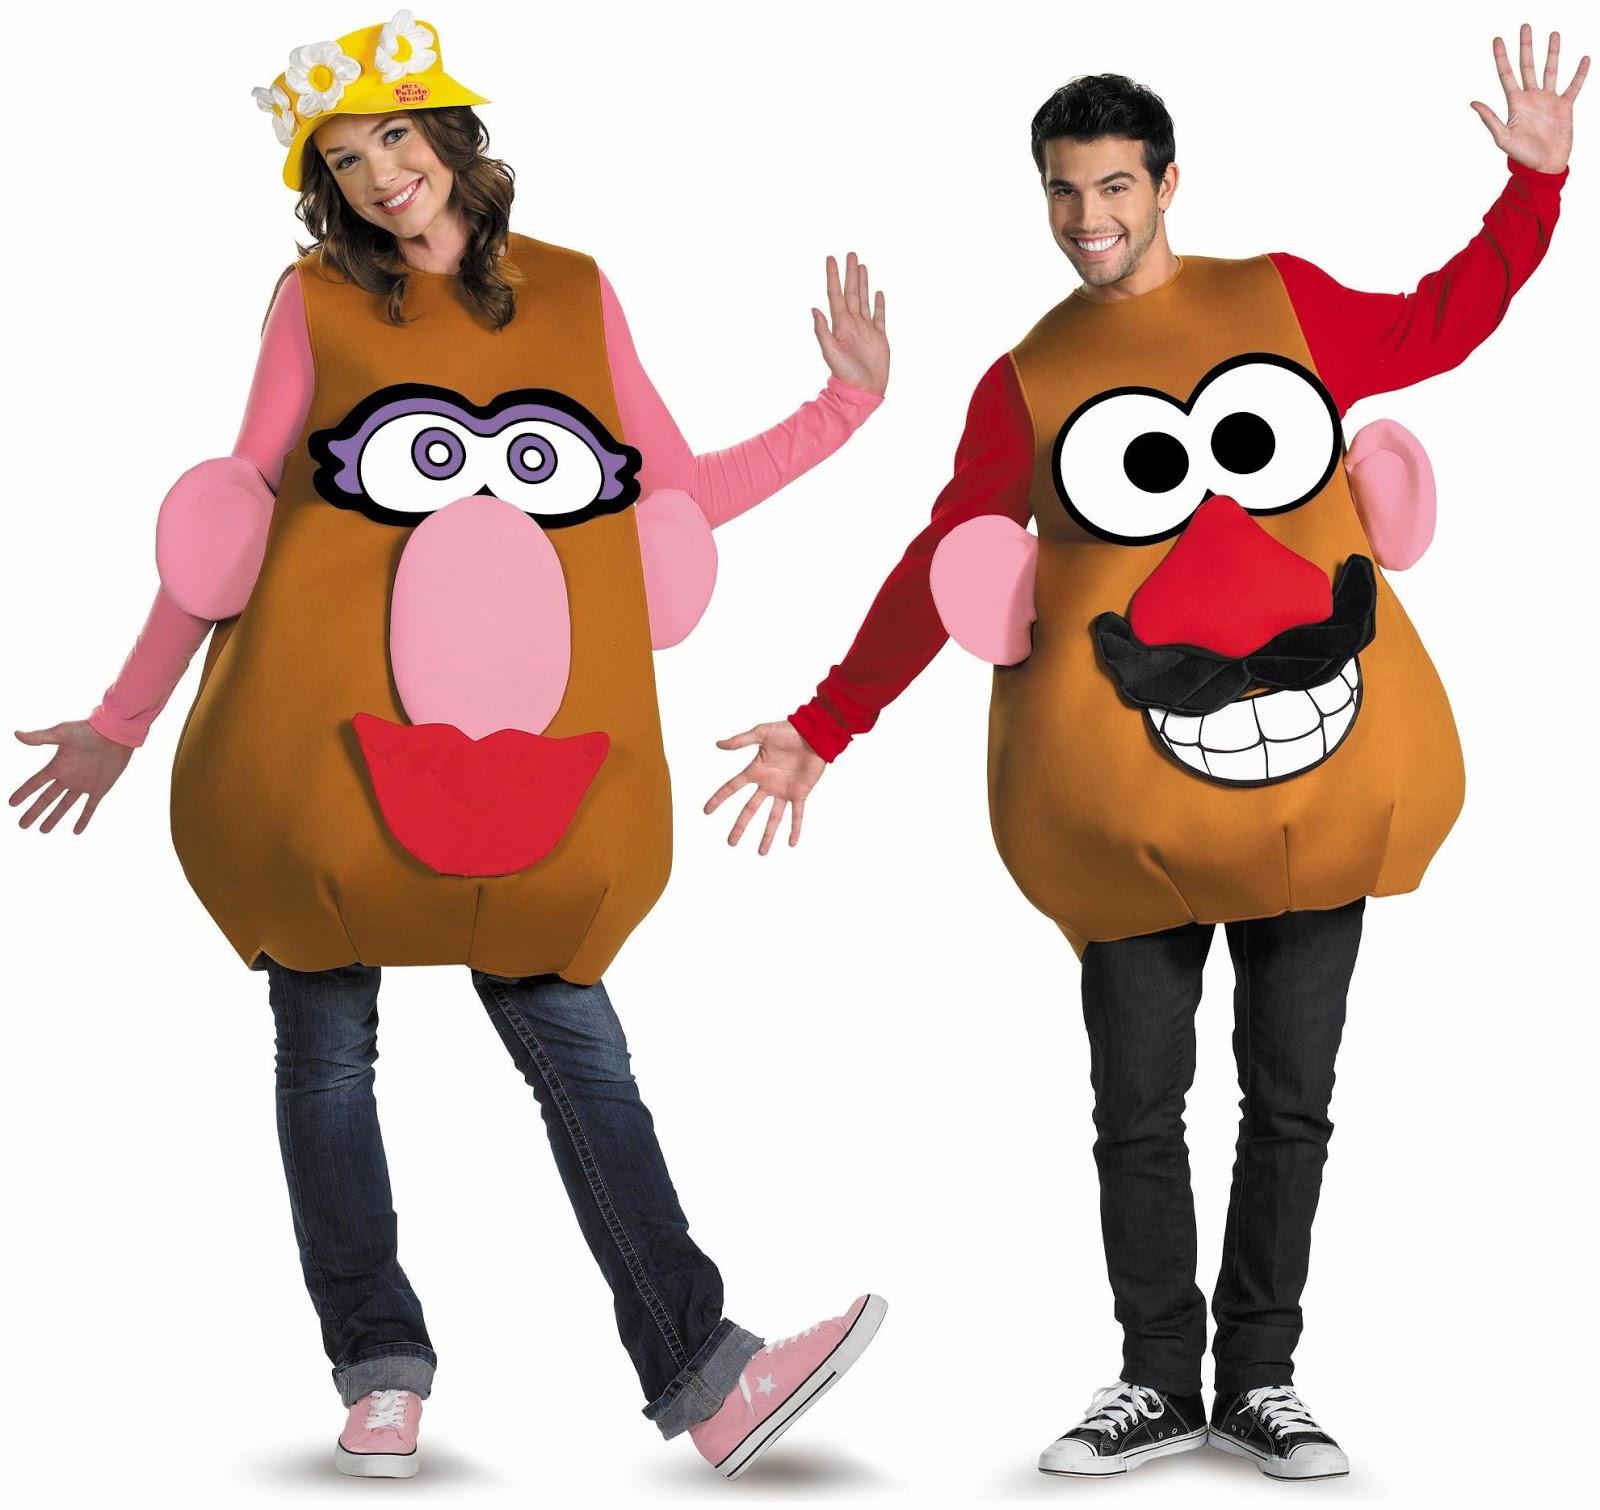 Mr. or Mrs. Potato Head Deluxe Adult Costume